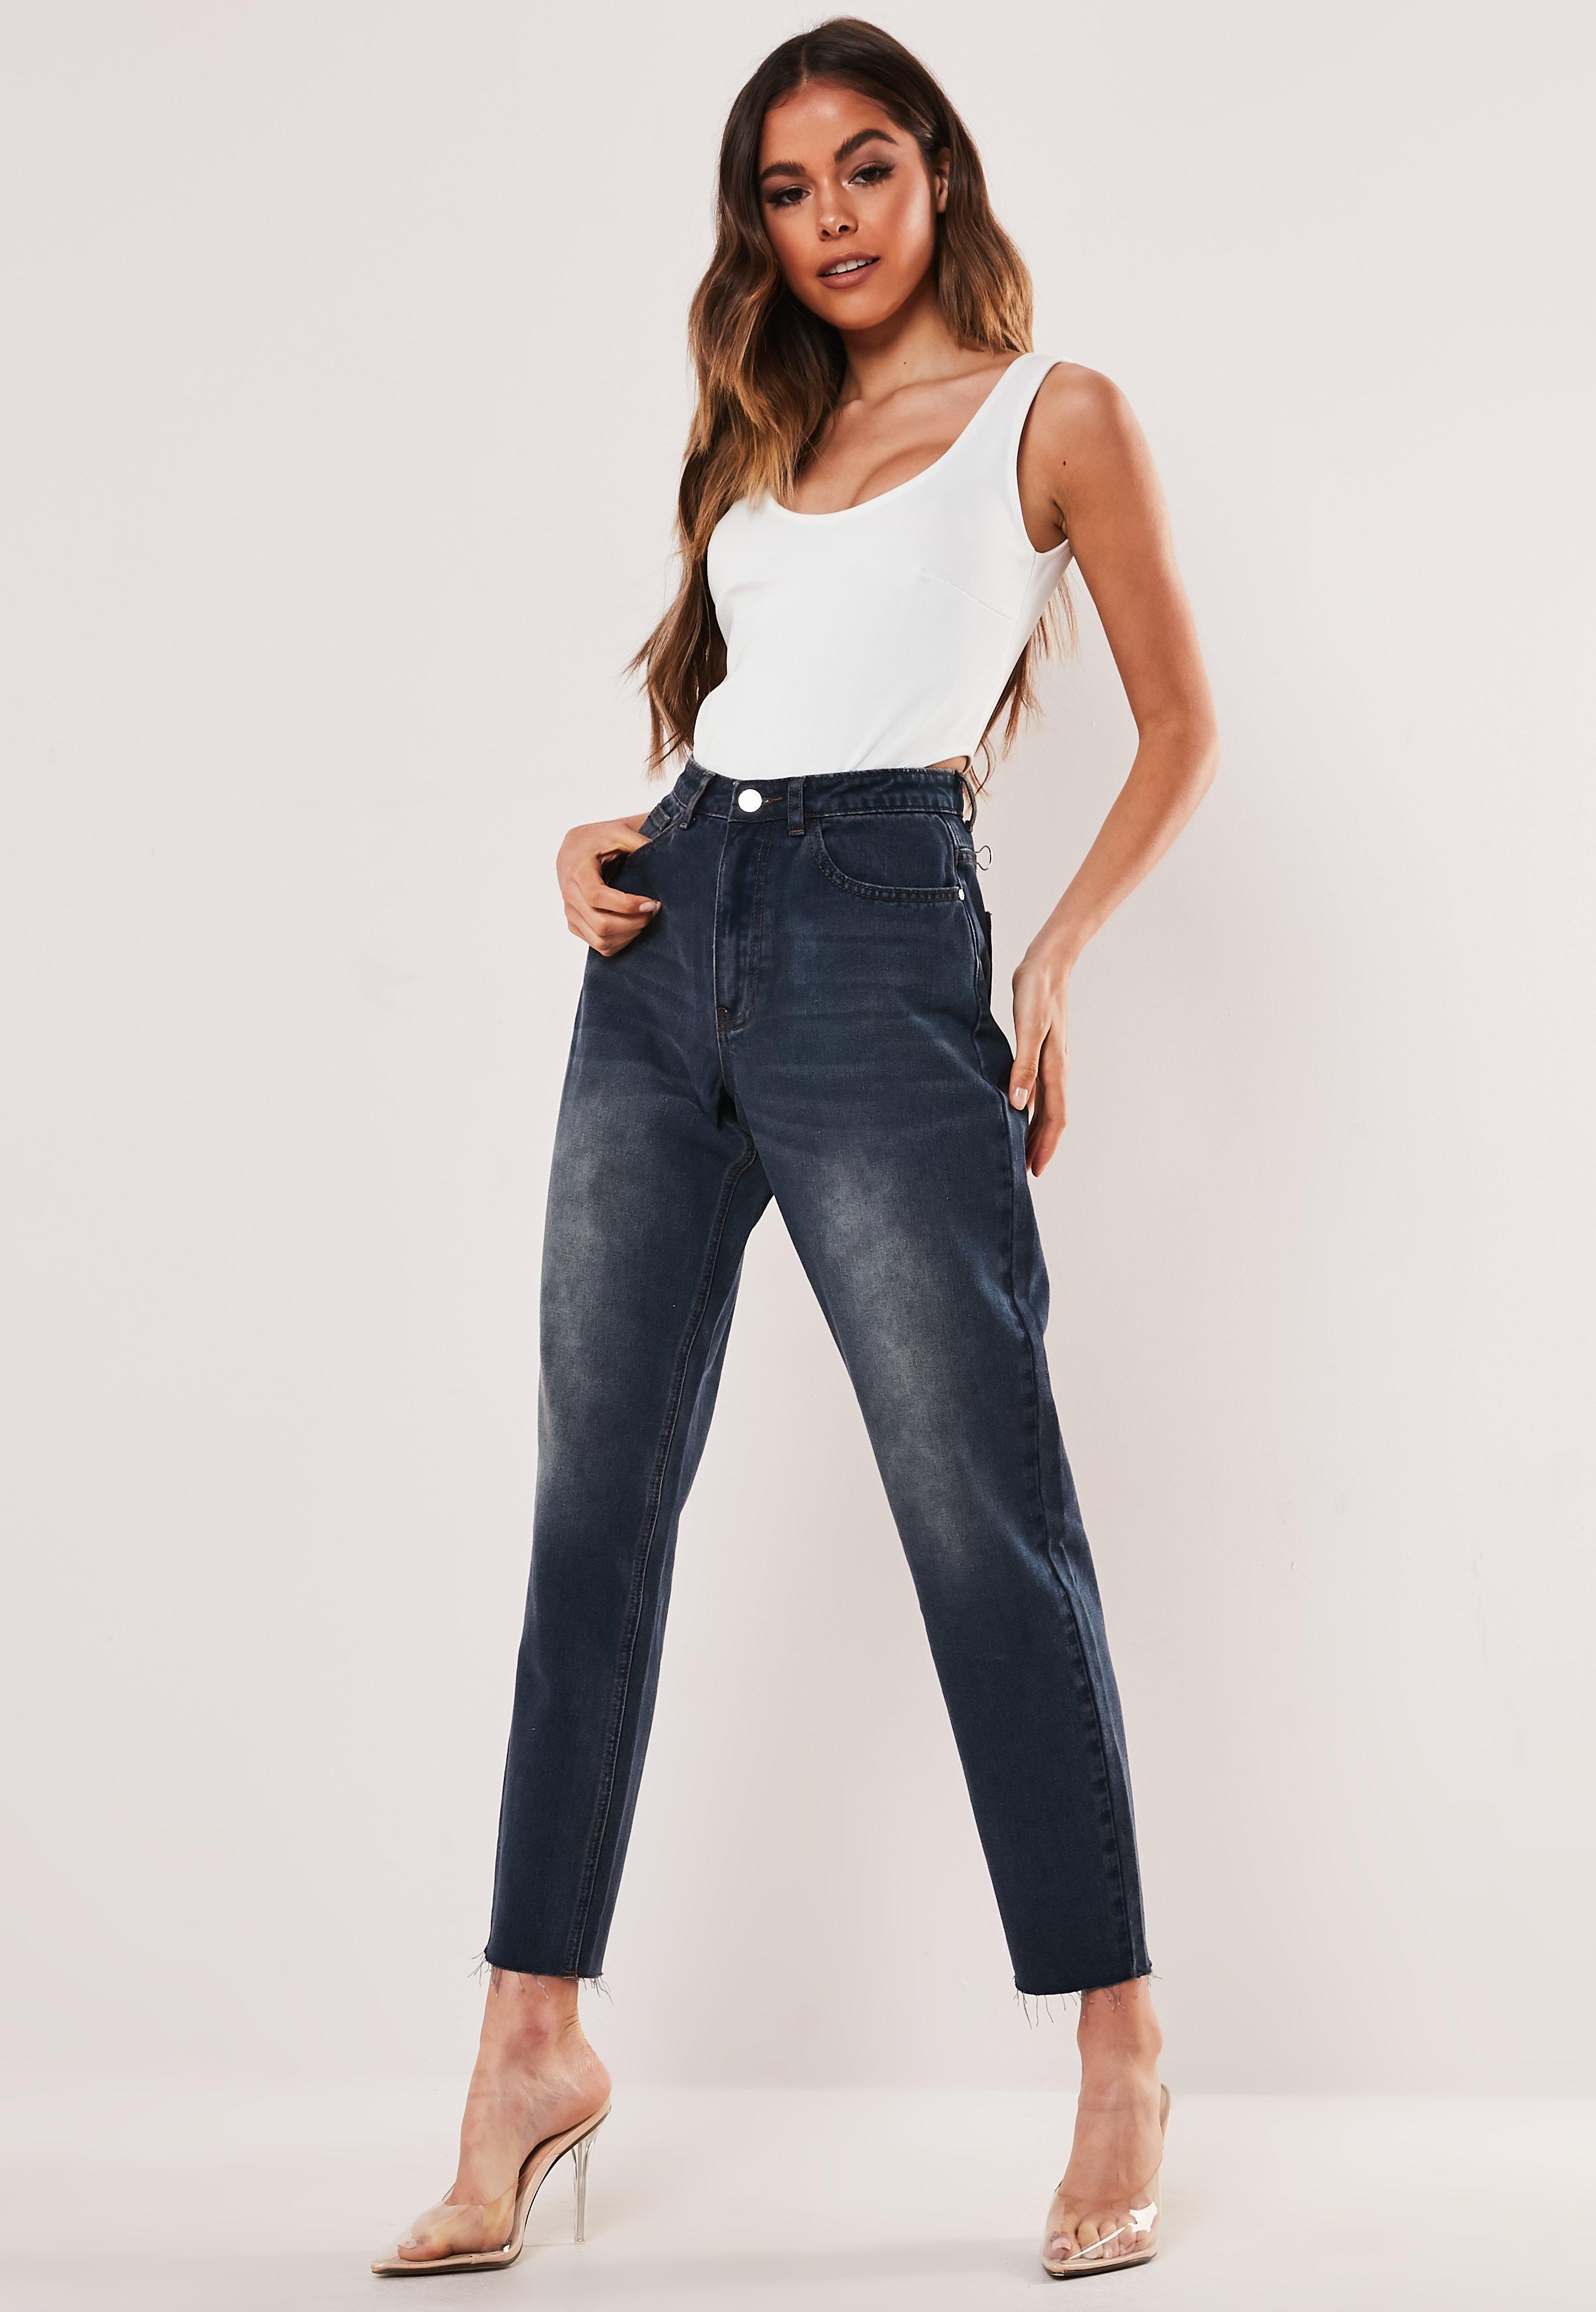 Haute Bleu Jeans Foncé Mom Taille FlK13JuTc5